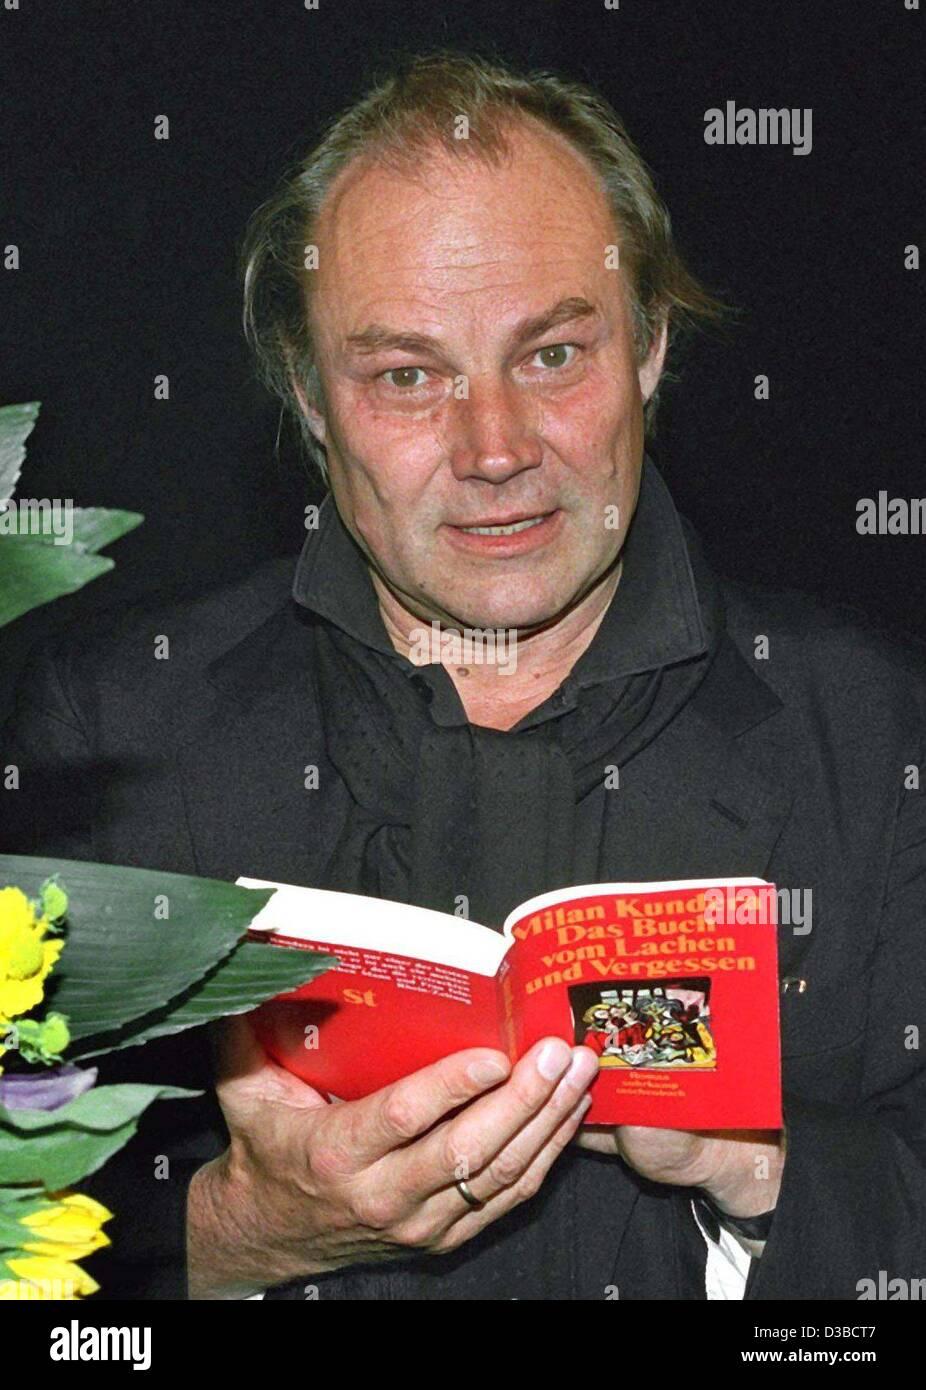 (dpa files) - Austrian actor Klaus Maria Brandauer flips through a book during a theater festival in Hanover-Herrnhausen, Stock Photo